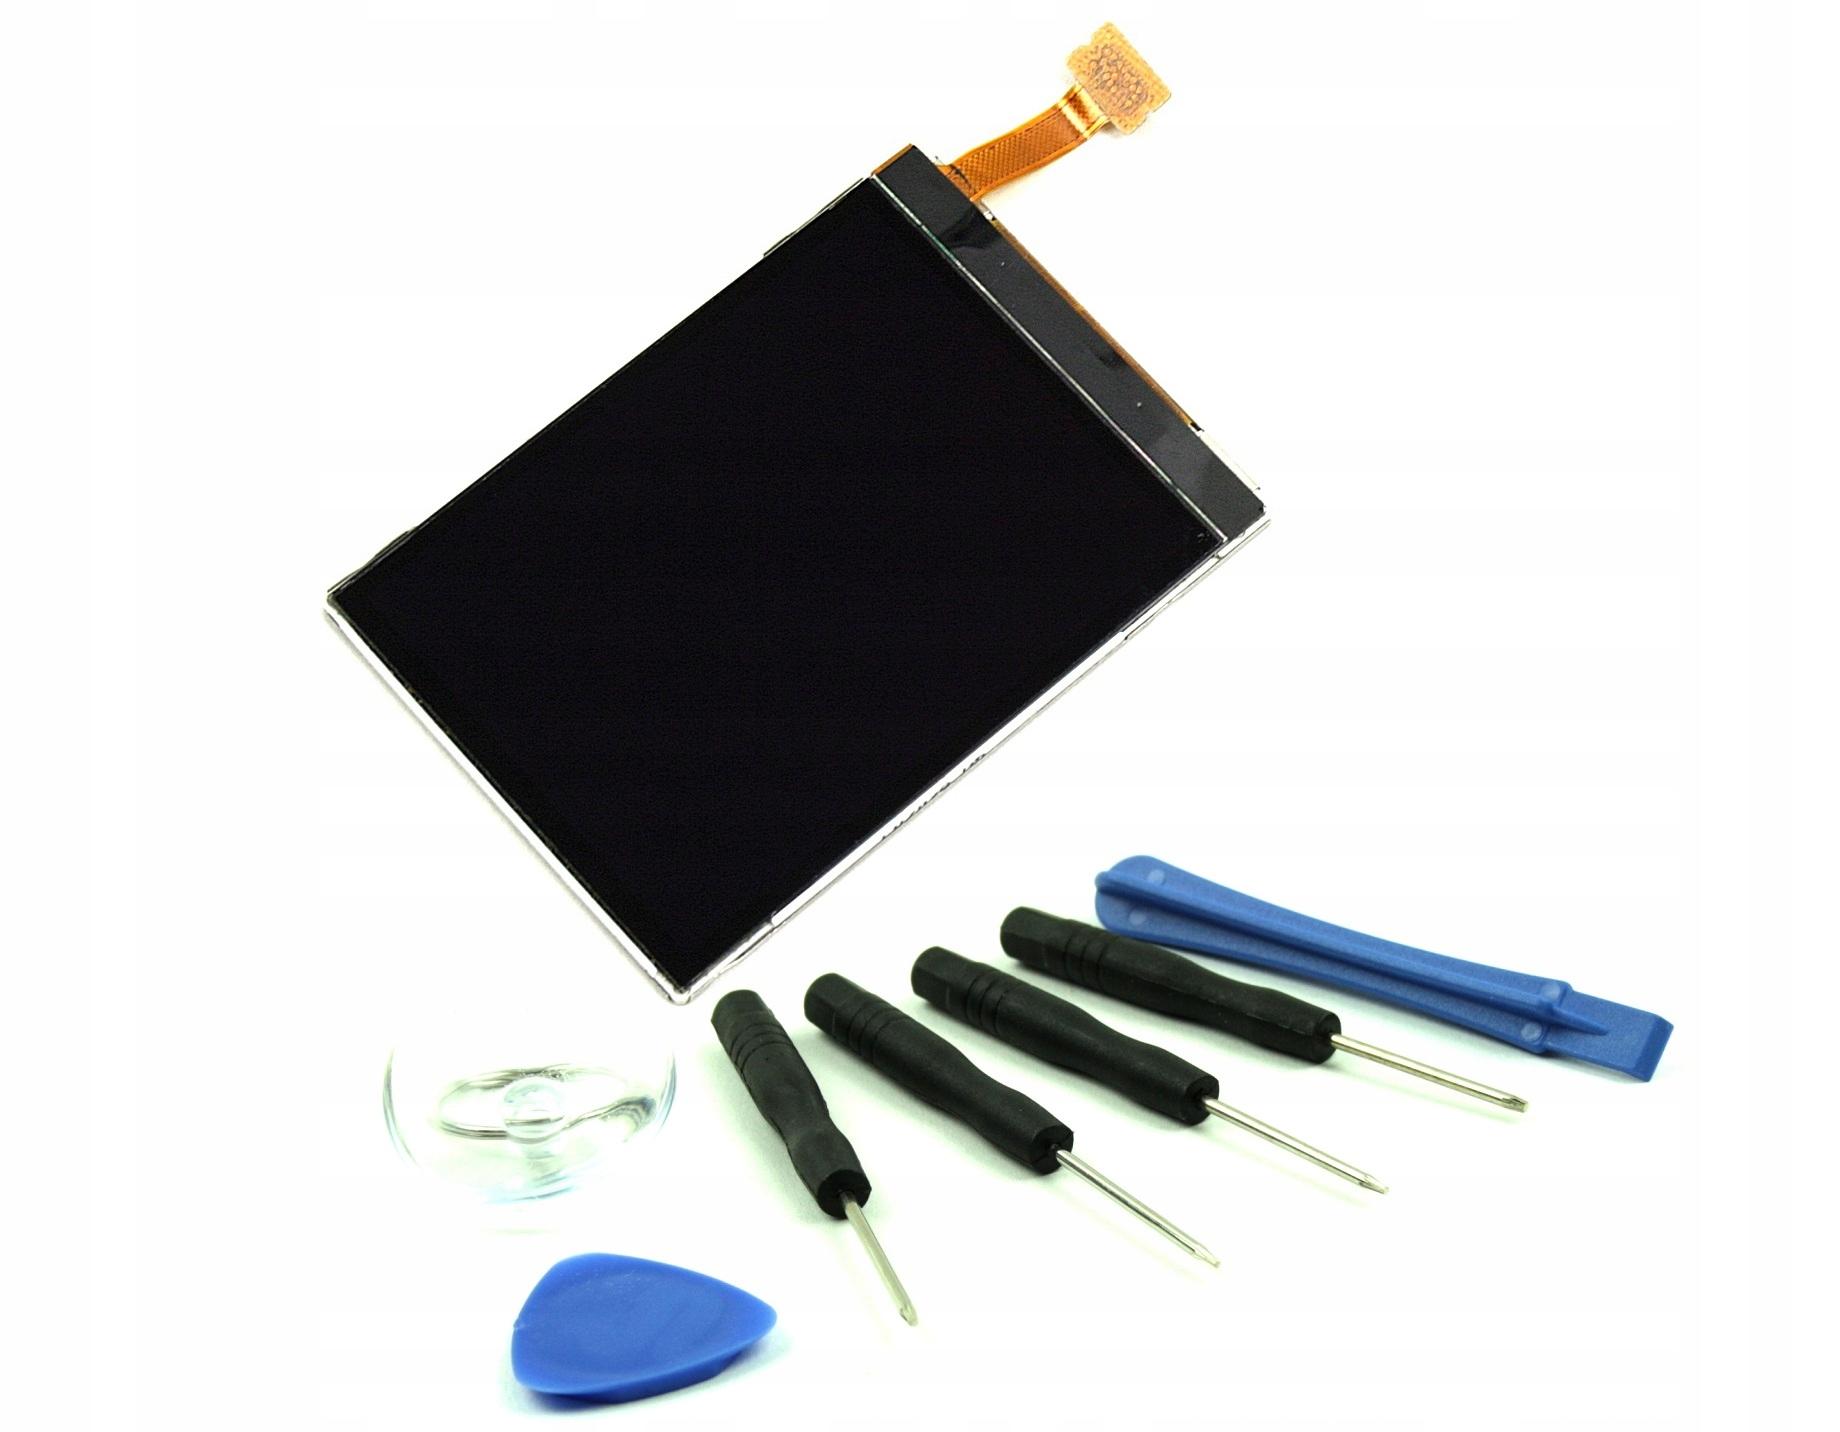 EKRAN WYŚWIETLACZ LCD NOKIA E52 E66 N78 6210N N82